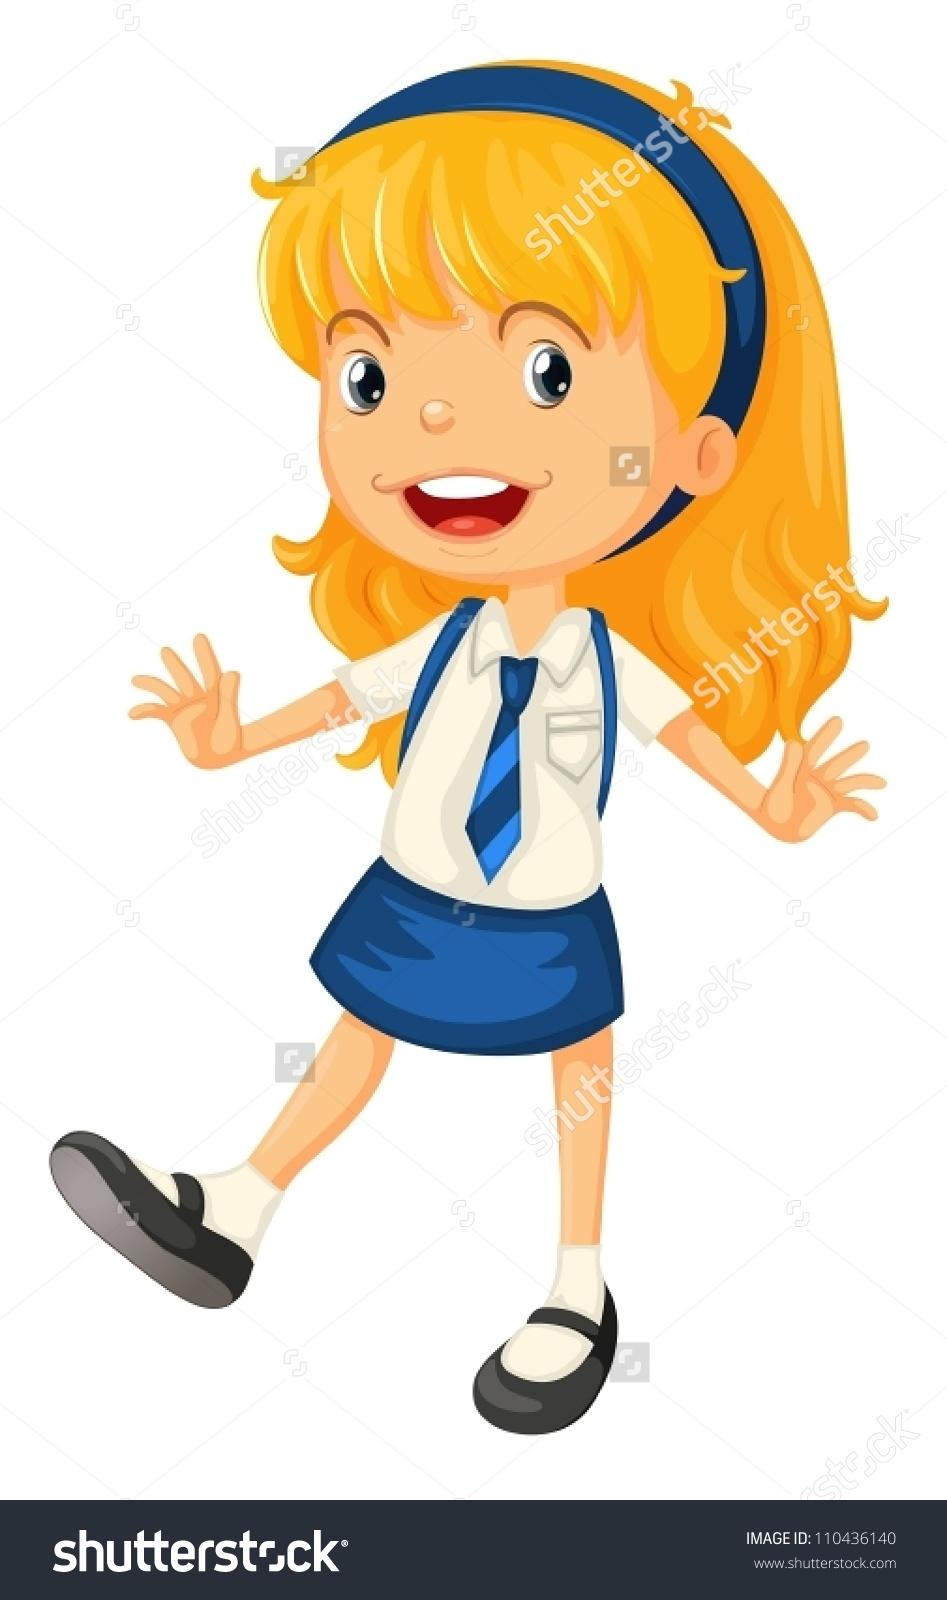 947x1600 Cliparts For School Uniforms